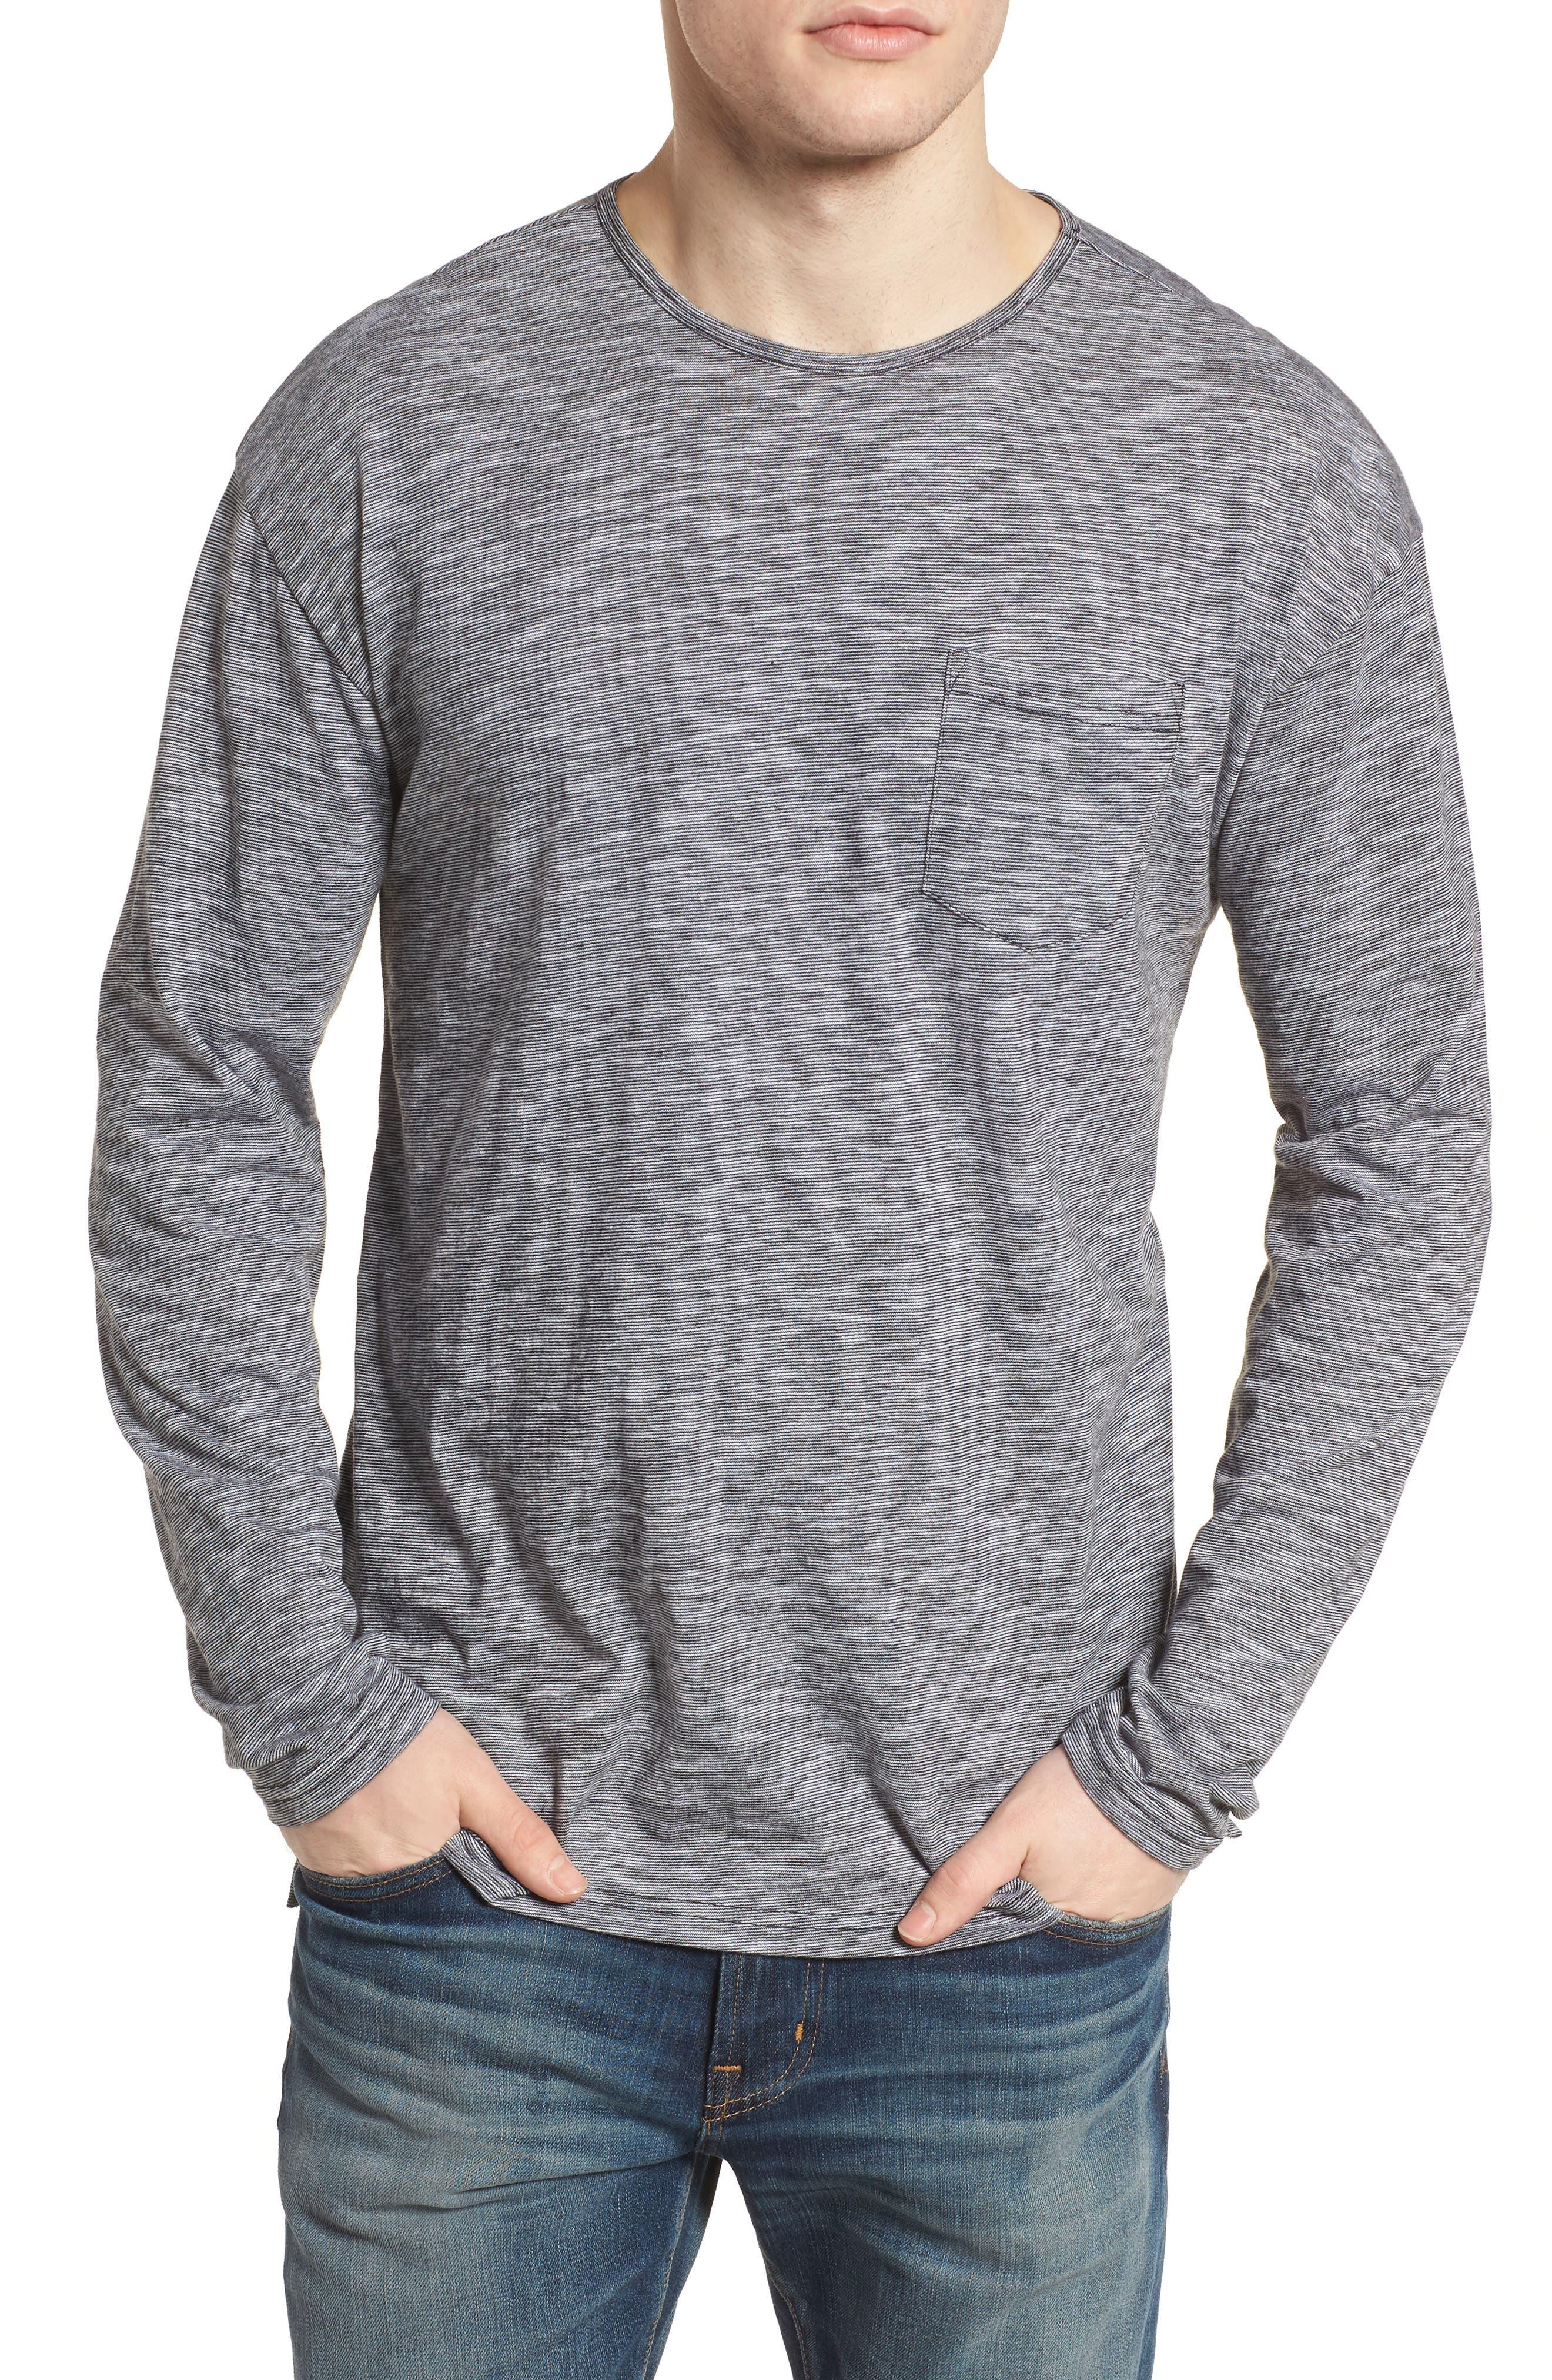 Steady Pocket T-Shirt,                         Main,                         color, 010